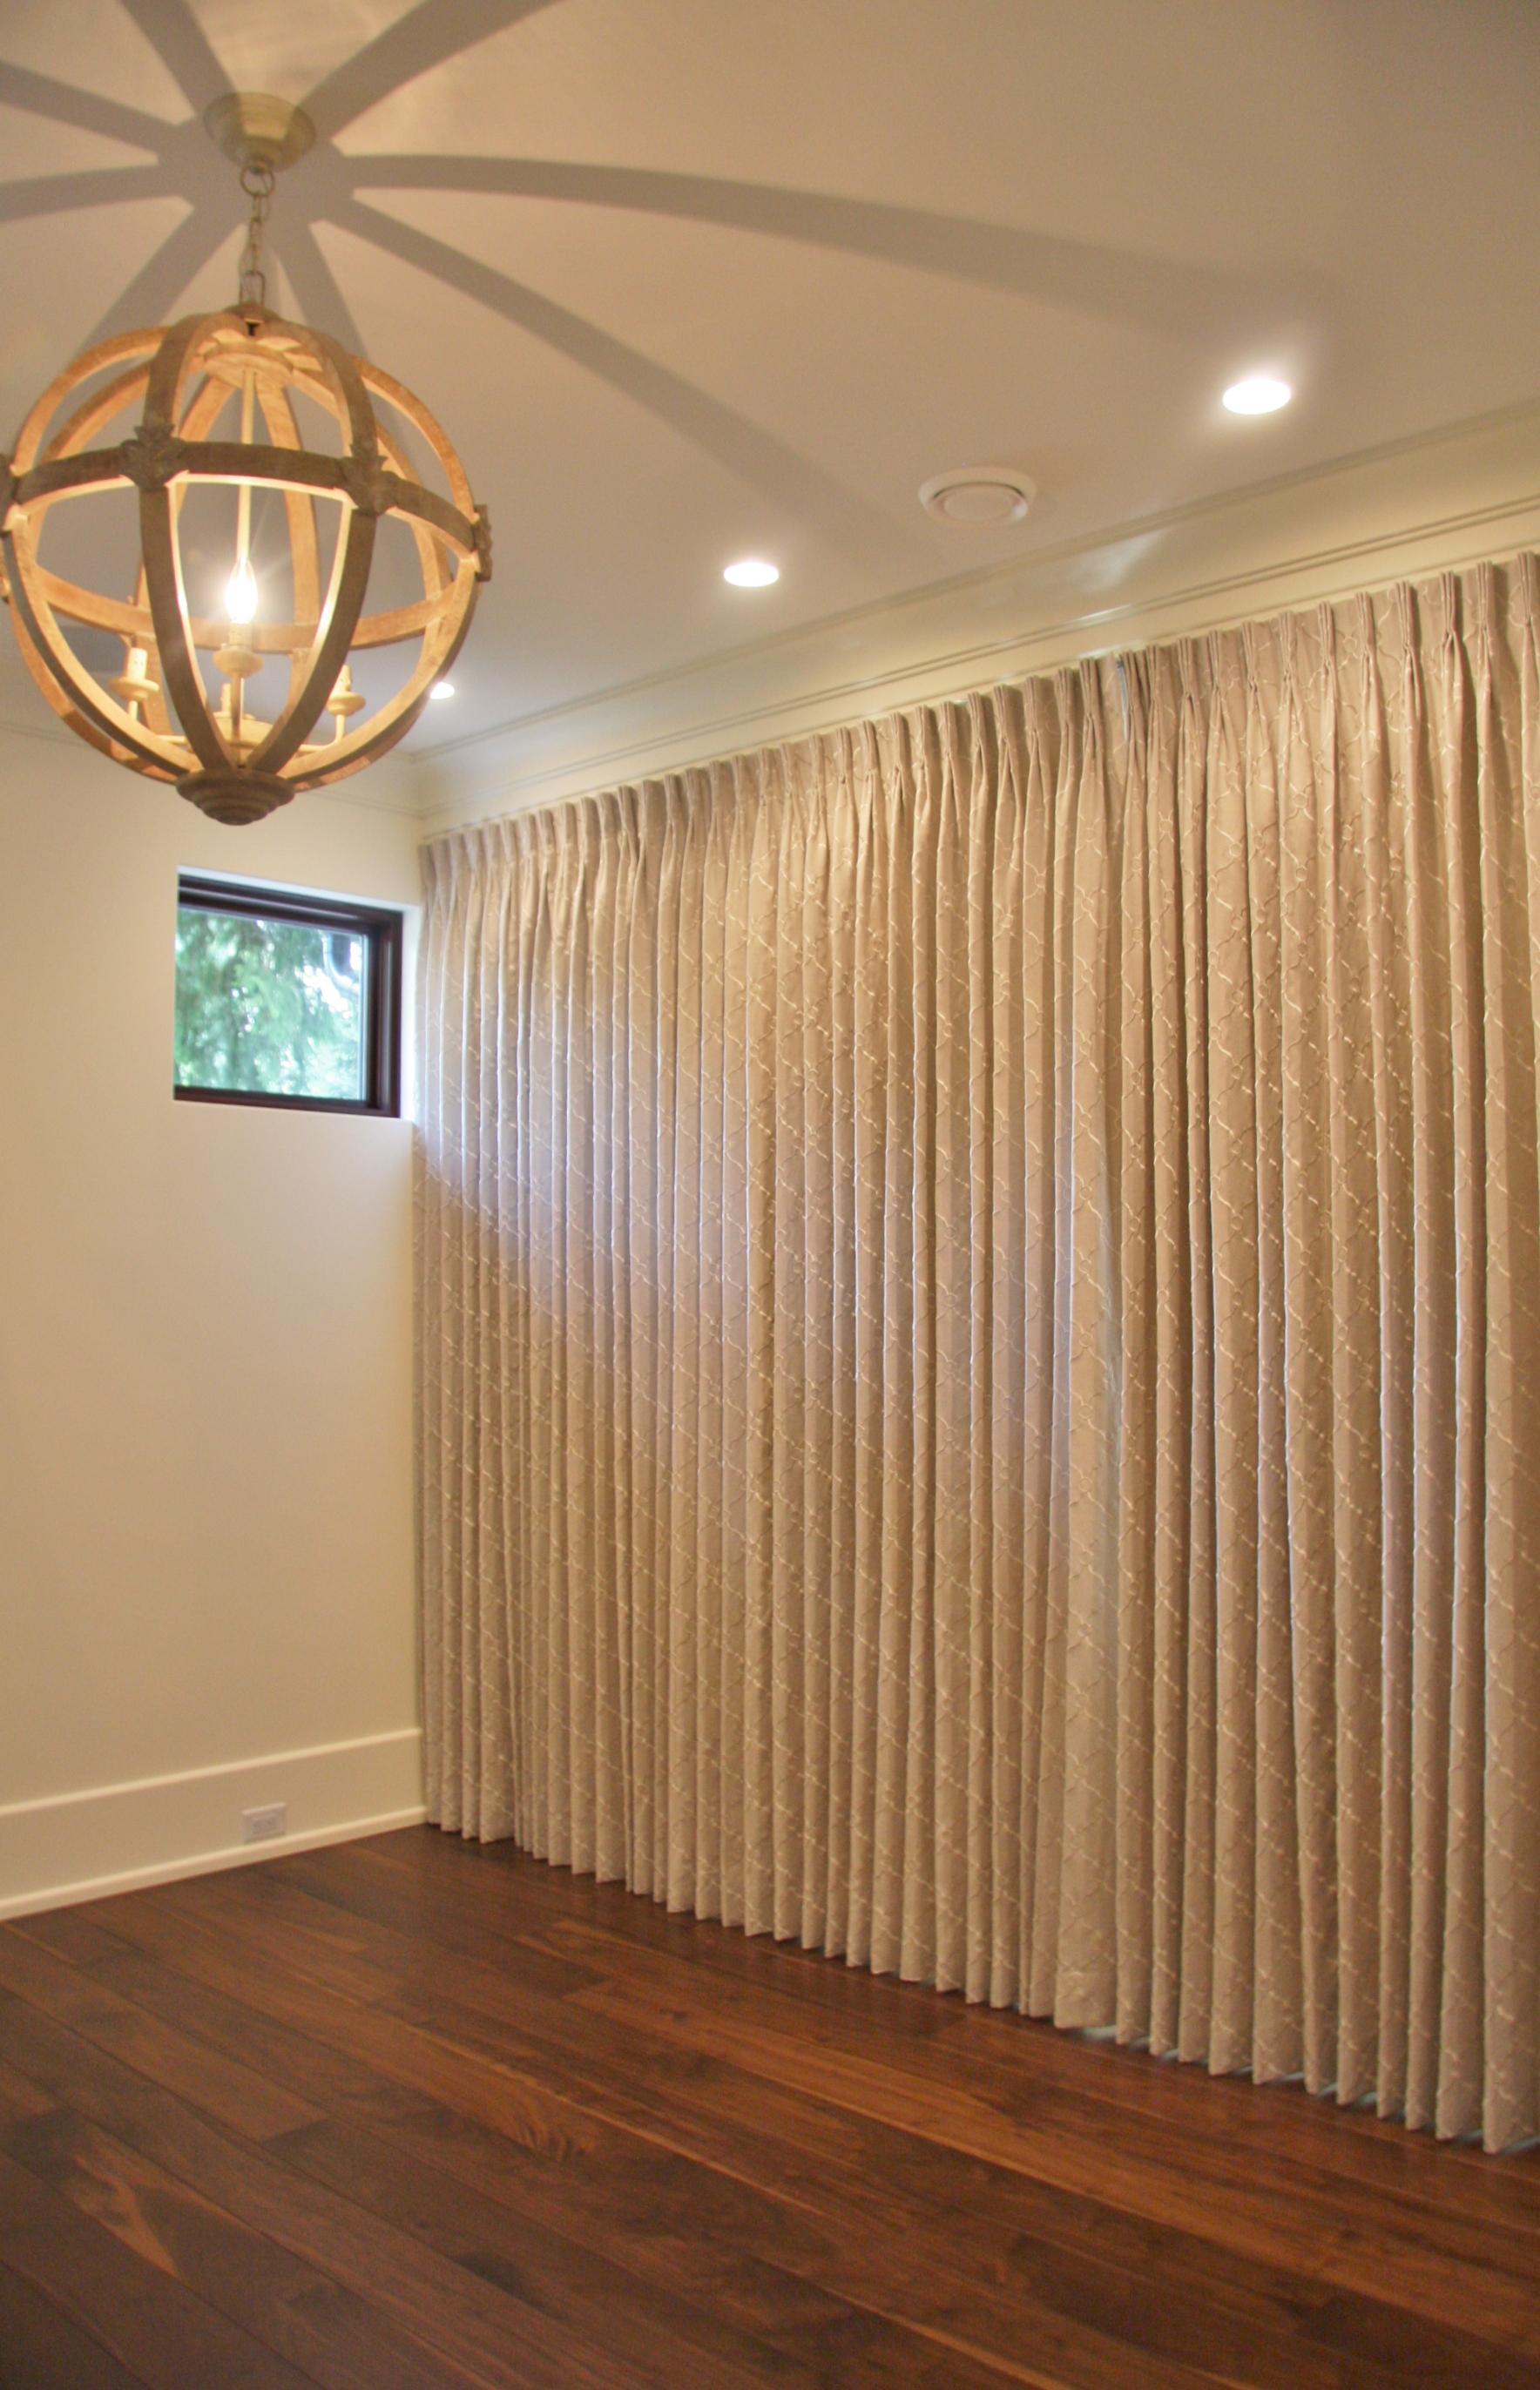 Wall to wall custom pinch pleat drapes